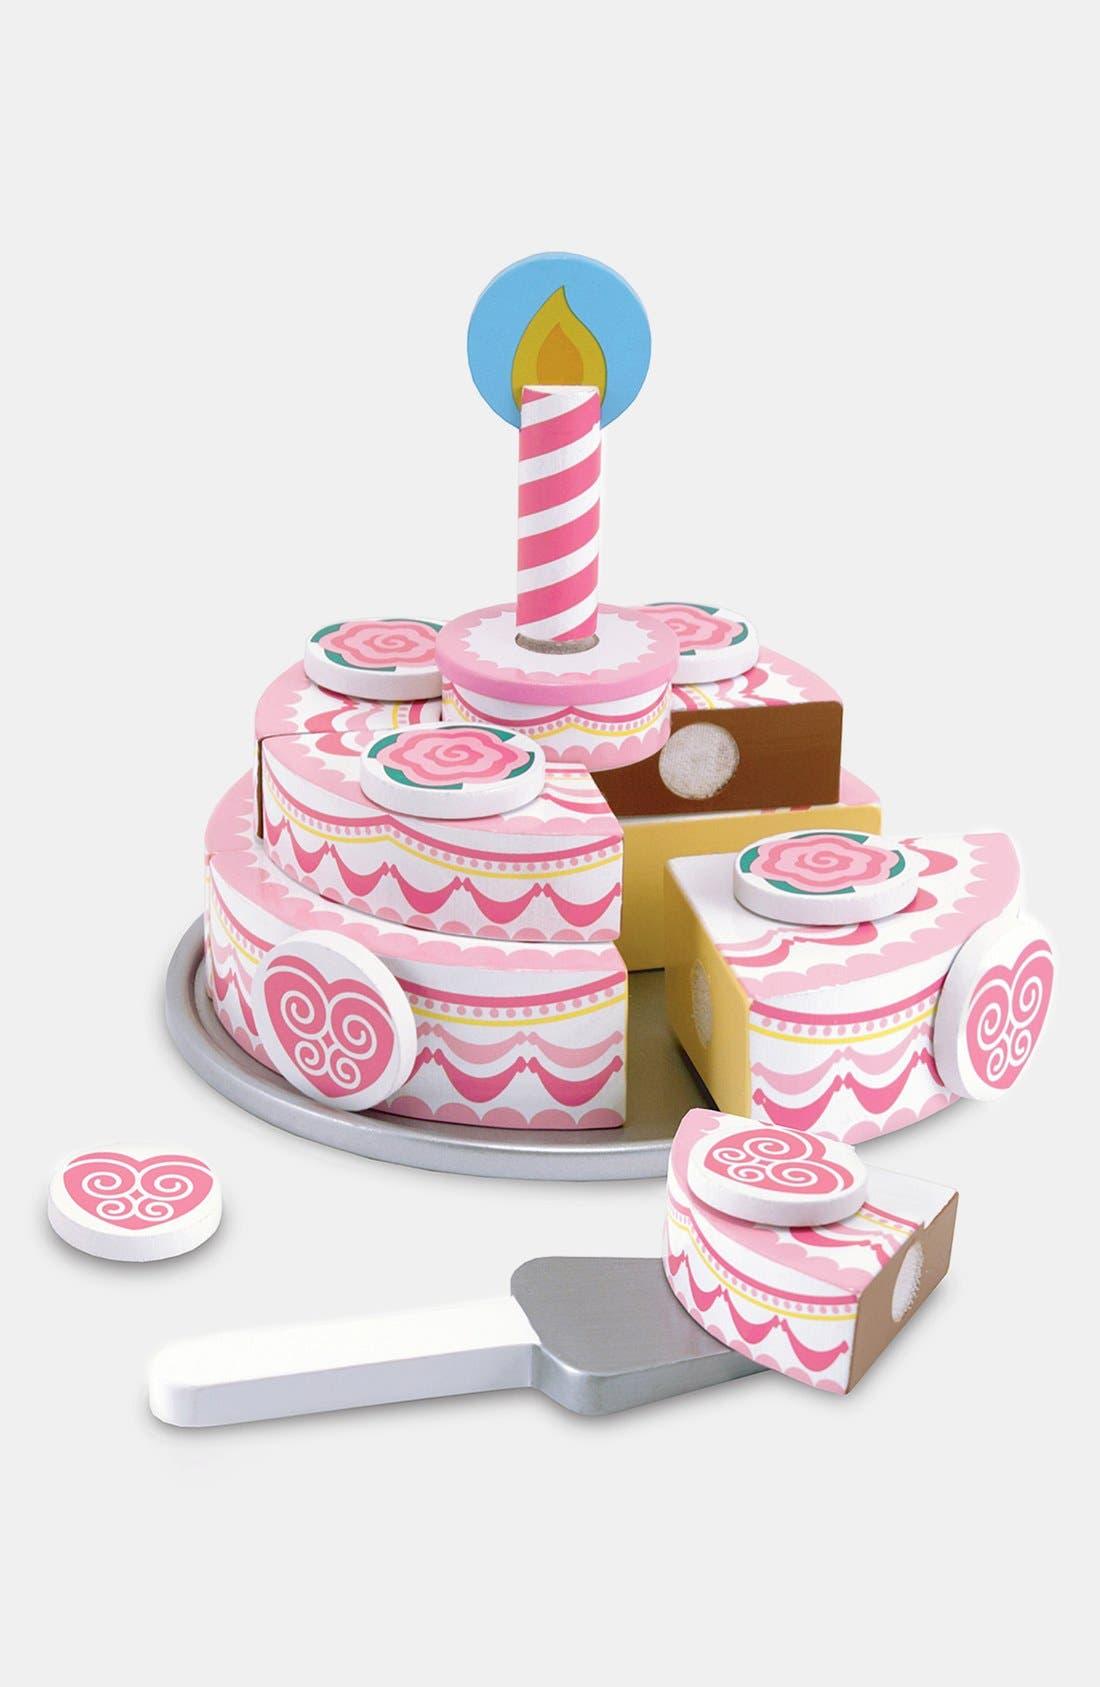 Melissa & Doug Triple Layer Party Cake